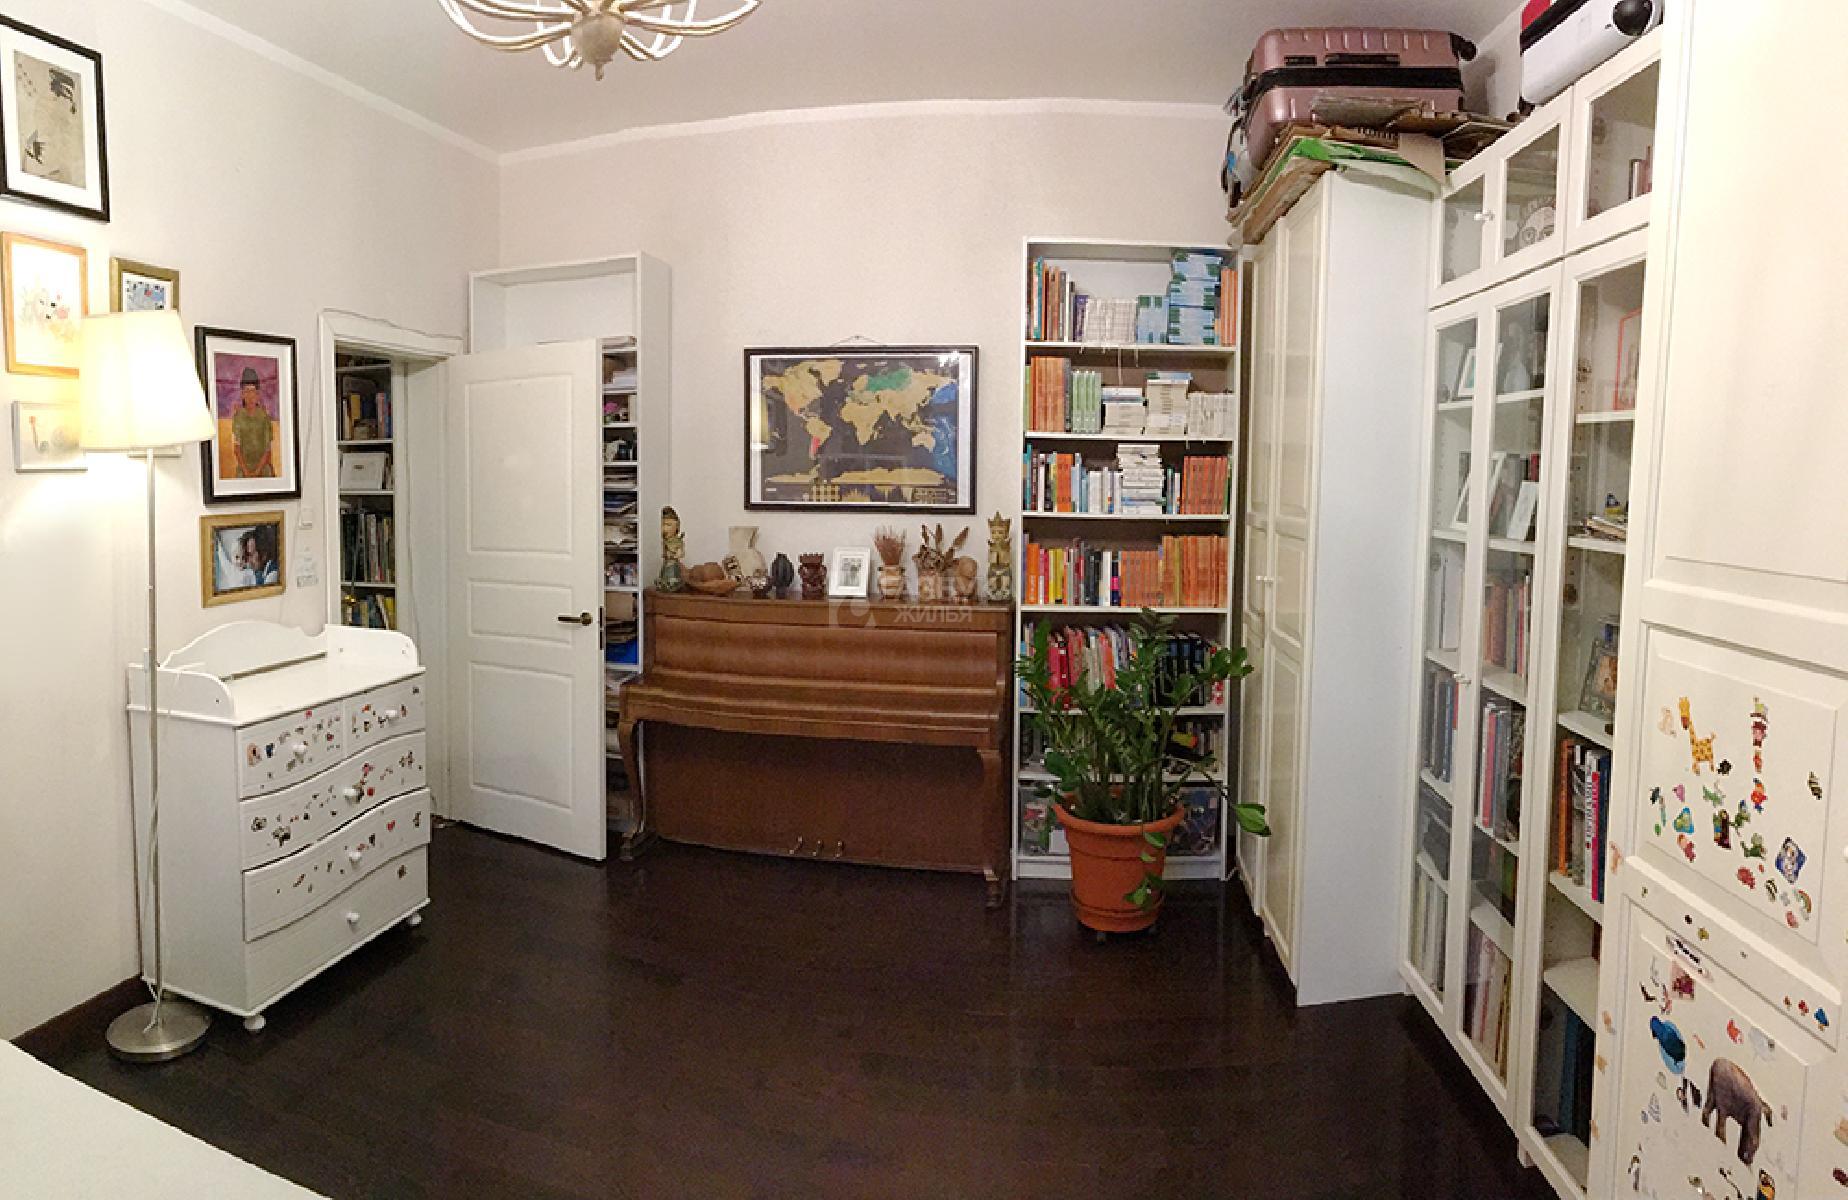 Фото №1 - 2-комнатная квартира, Москва, Комсомольский проспект 14/1 корпус 2, метро Парк культуры